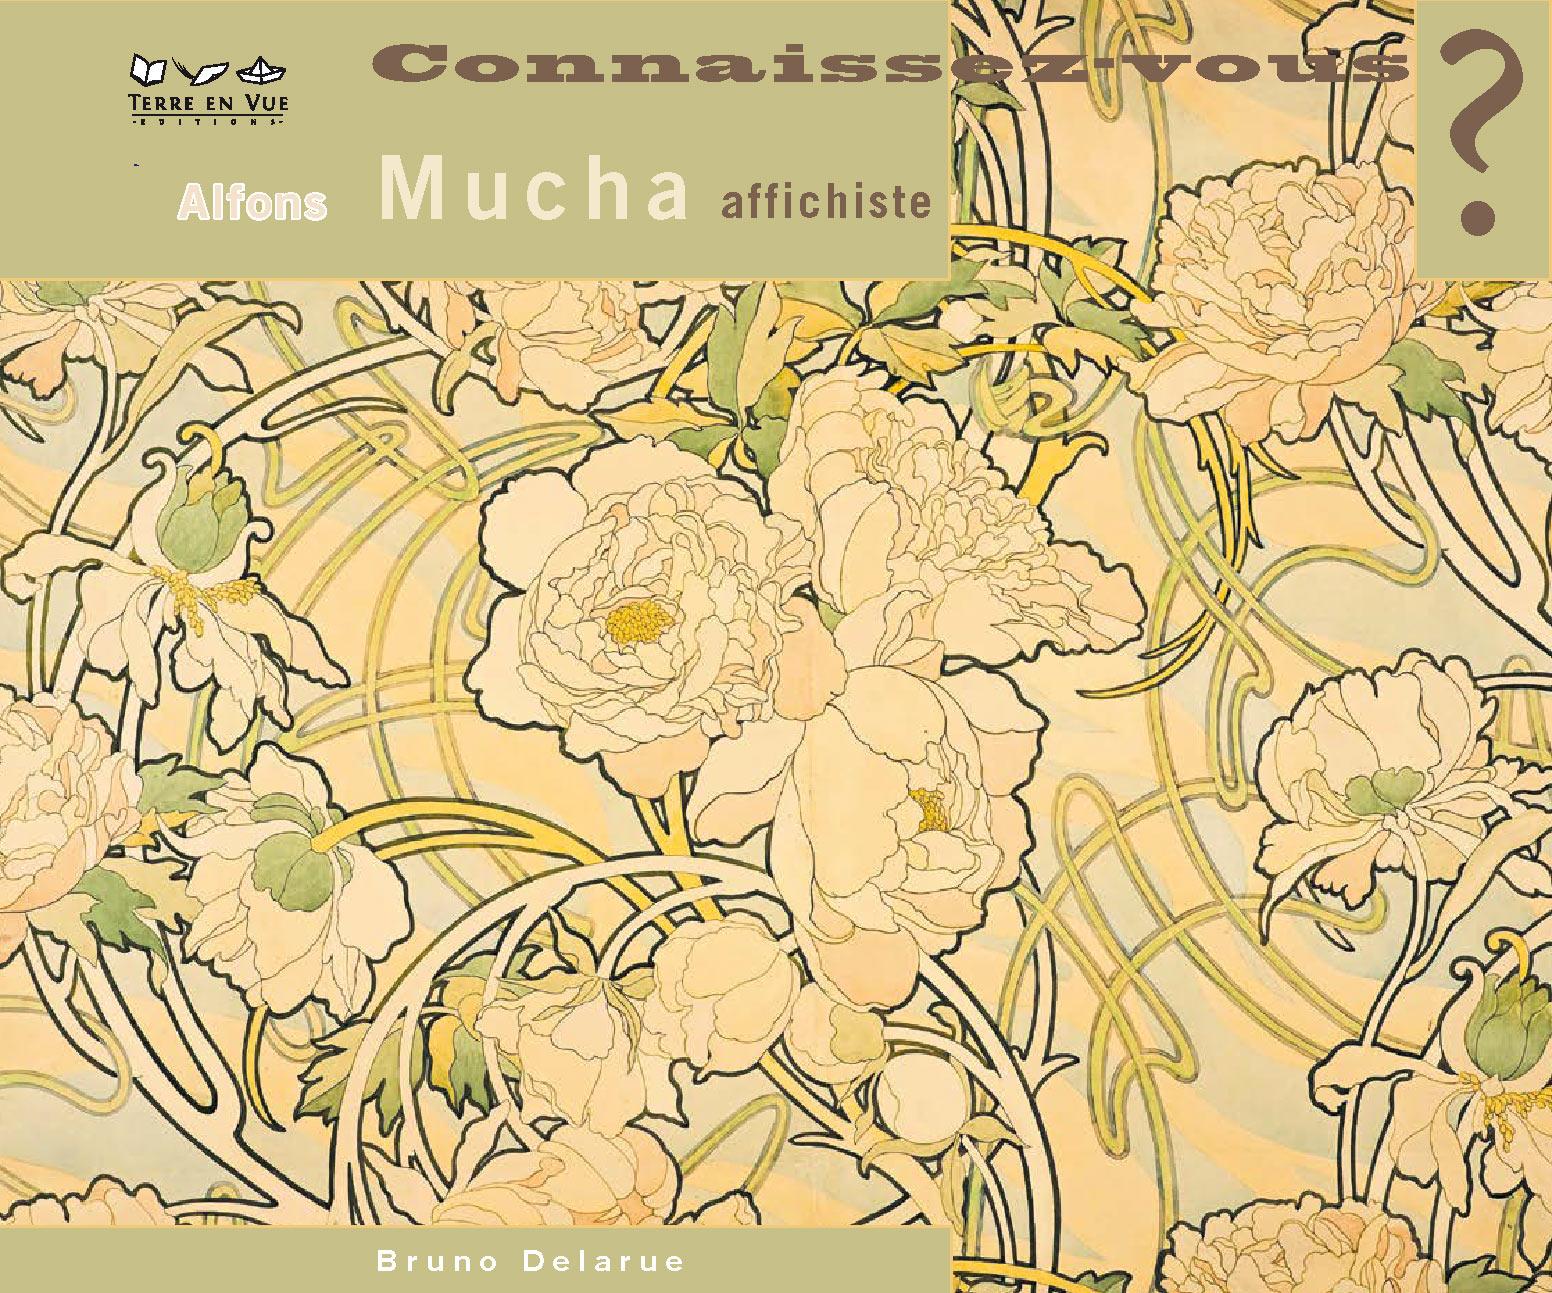 Alfons Mucha, affichiste